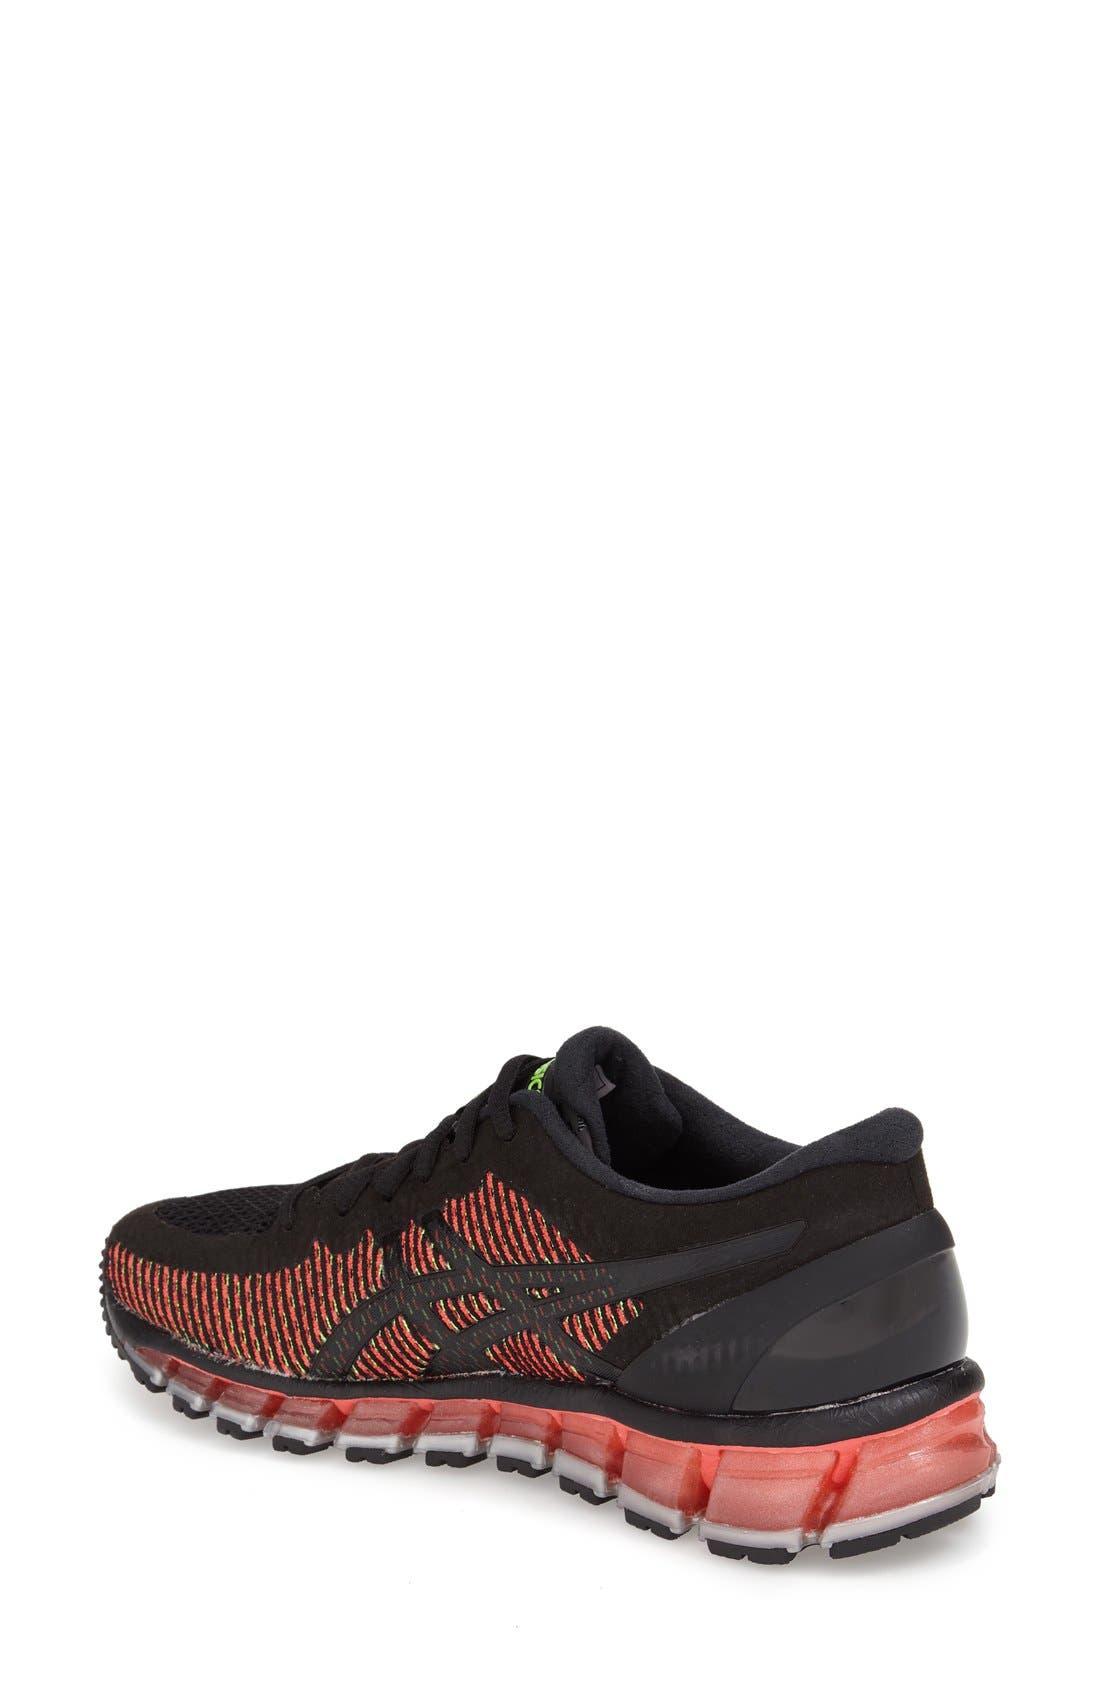 'GEL-Quantum 360' Running Shoe,                             Alternate thumbnail 2, color,                             001